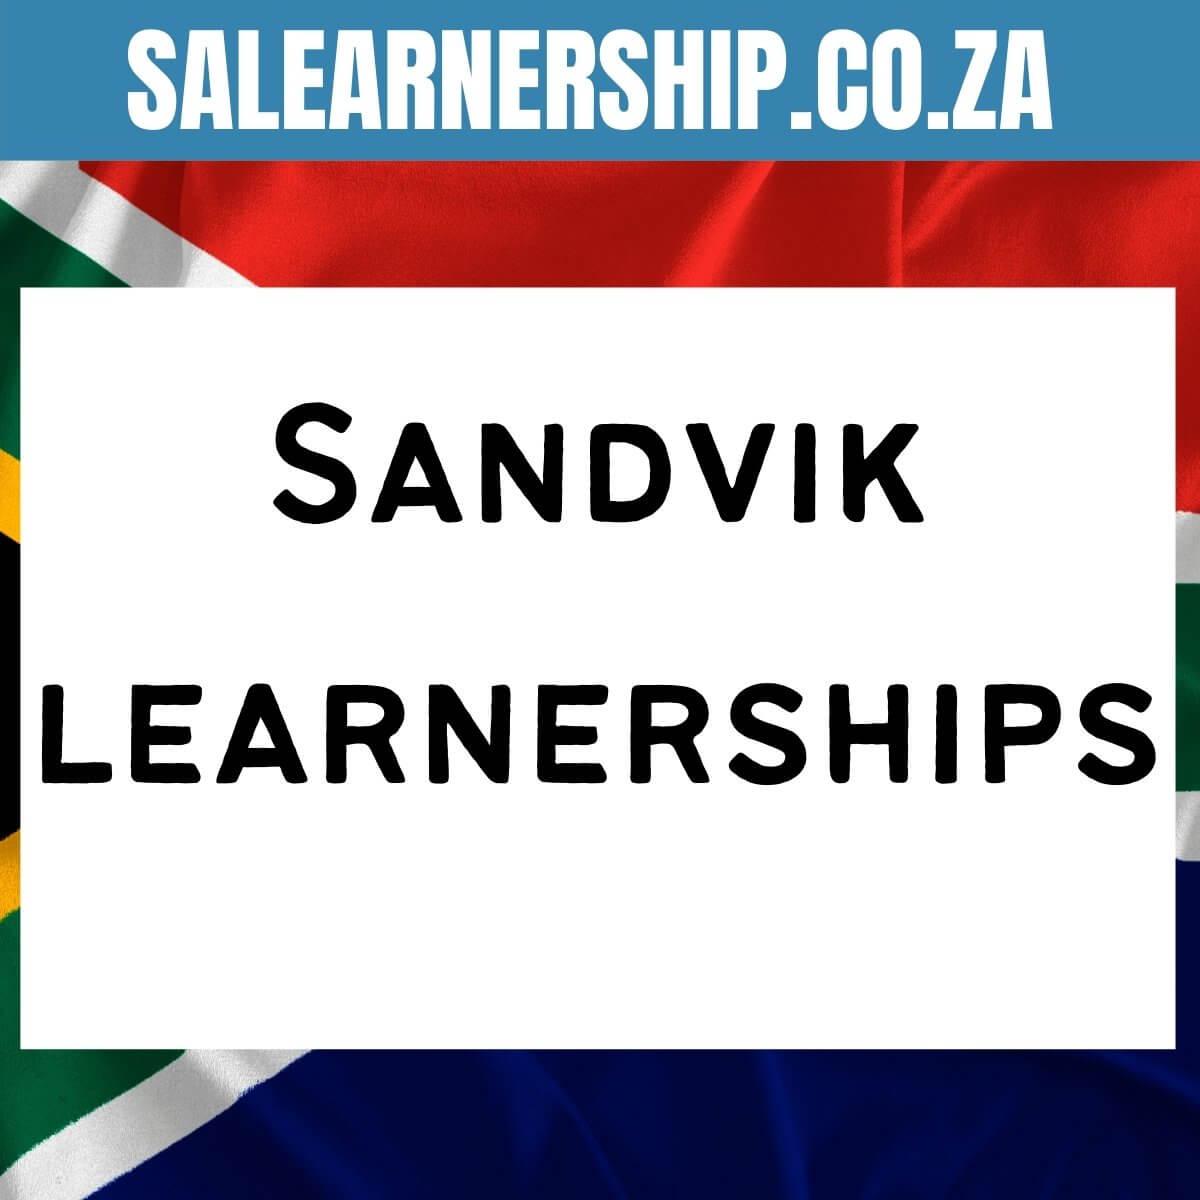 Sandvik learnerships